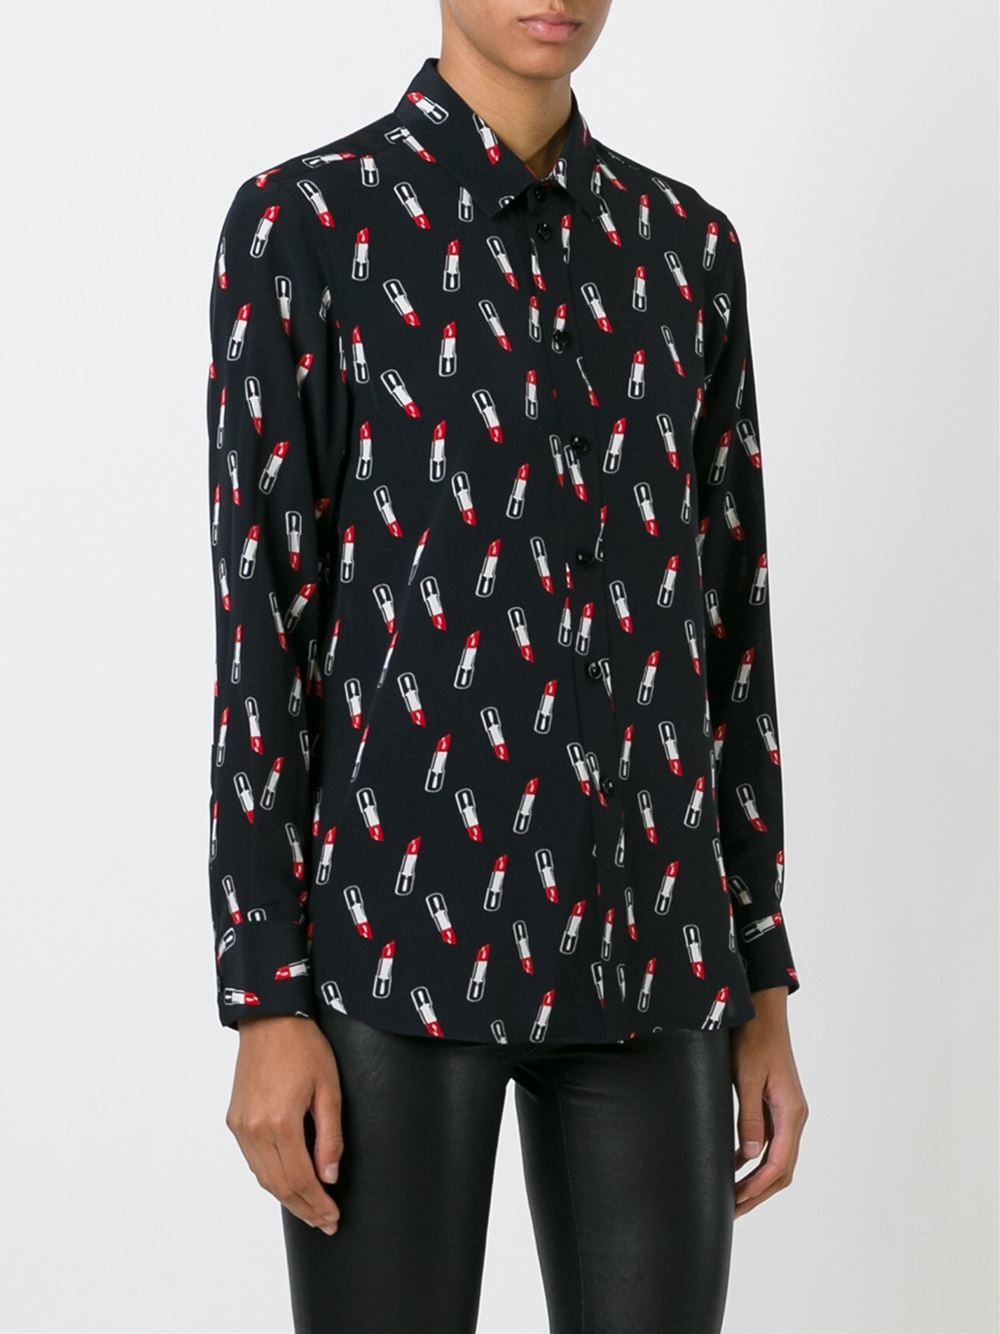 Saint Laurent Lipstick Print Blouse In Red Black Lyst